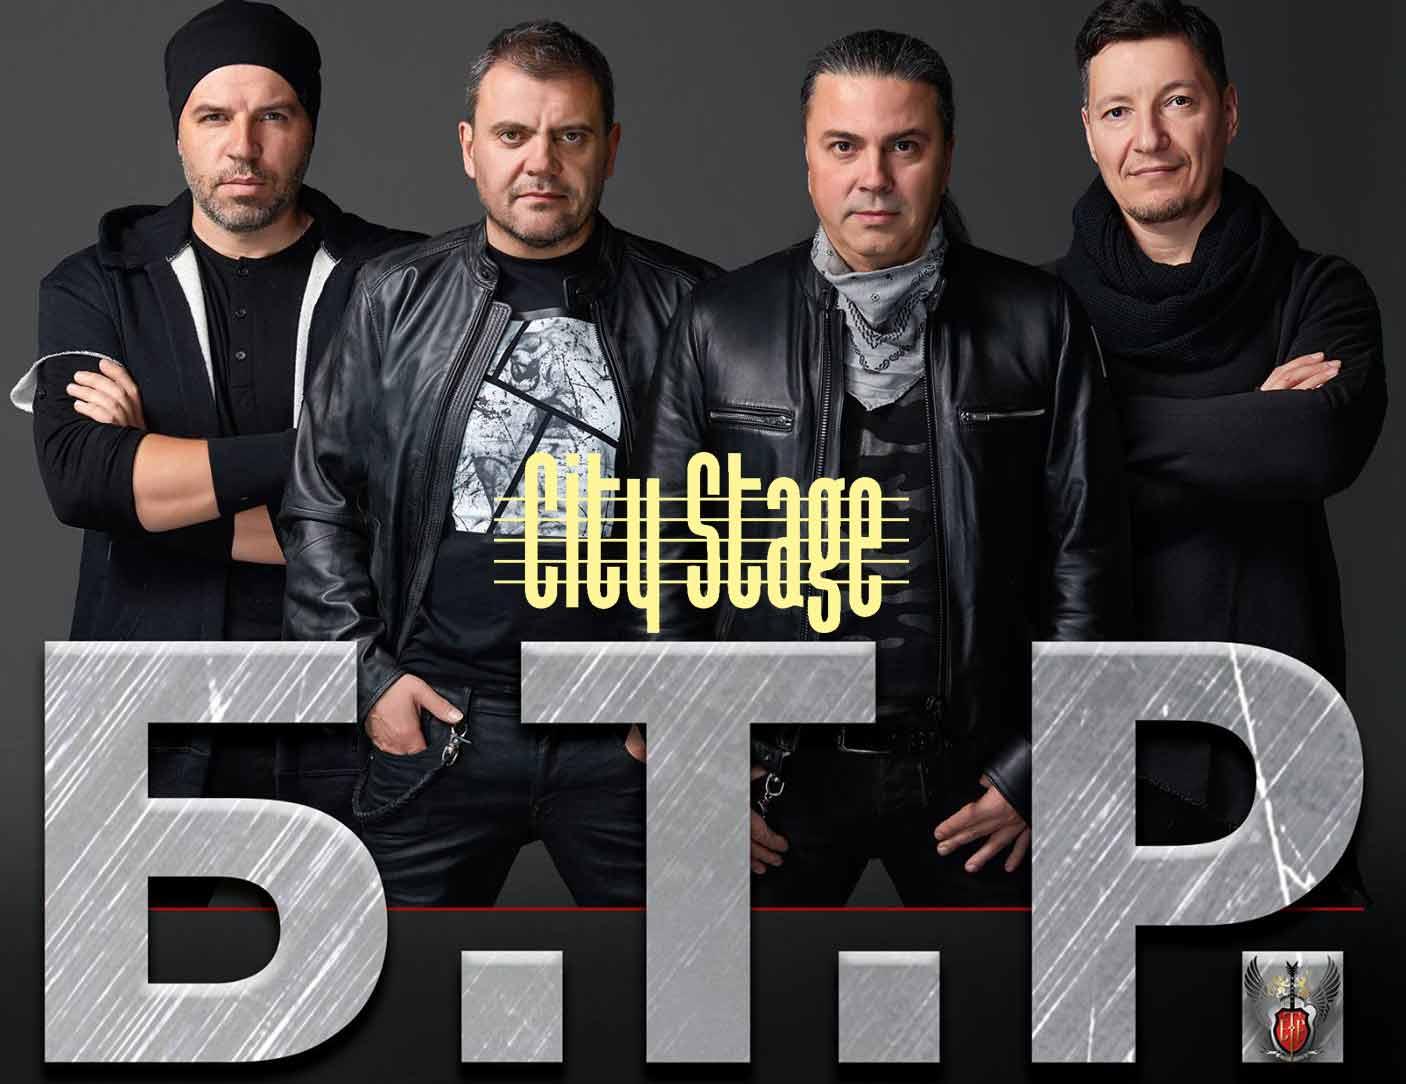 19 април 2019 г. 20:00 ч. City Stage | БТР